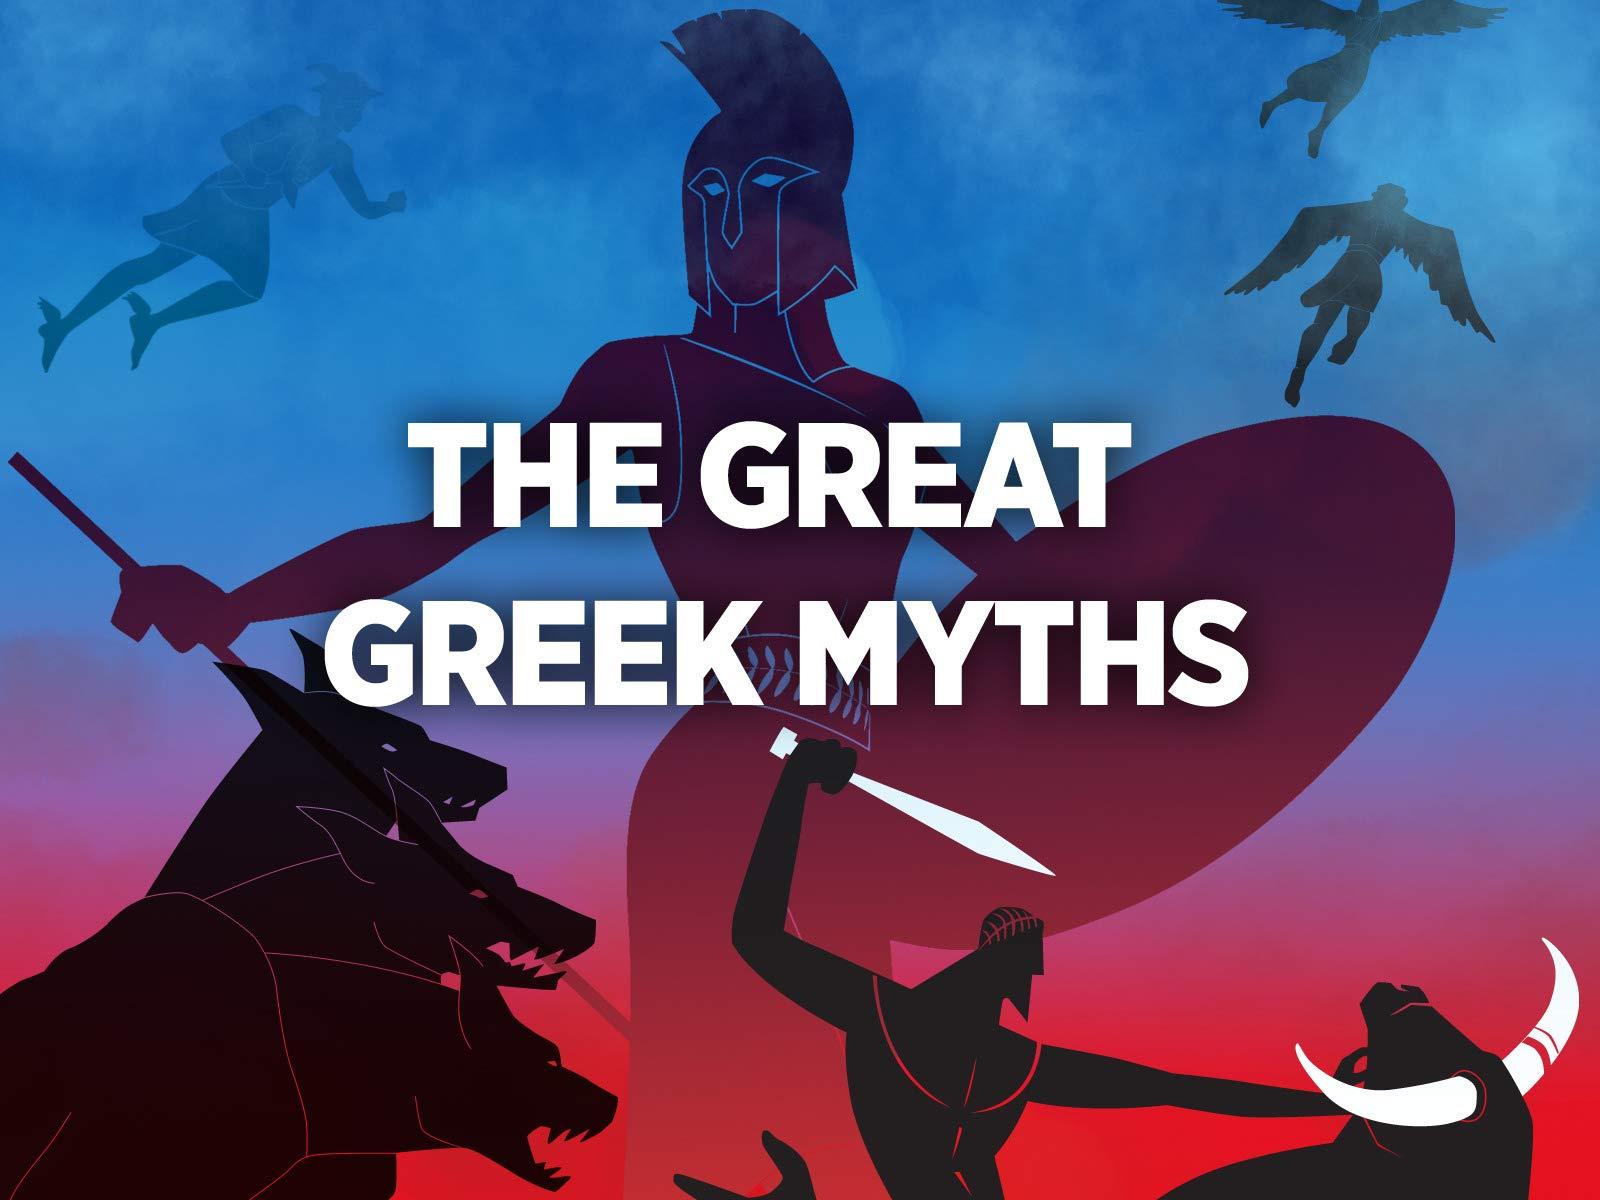 The Great Greek Myths - Season 1